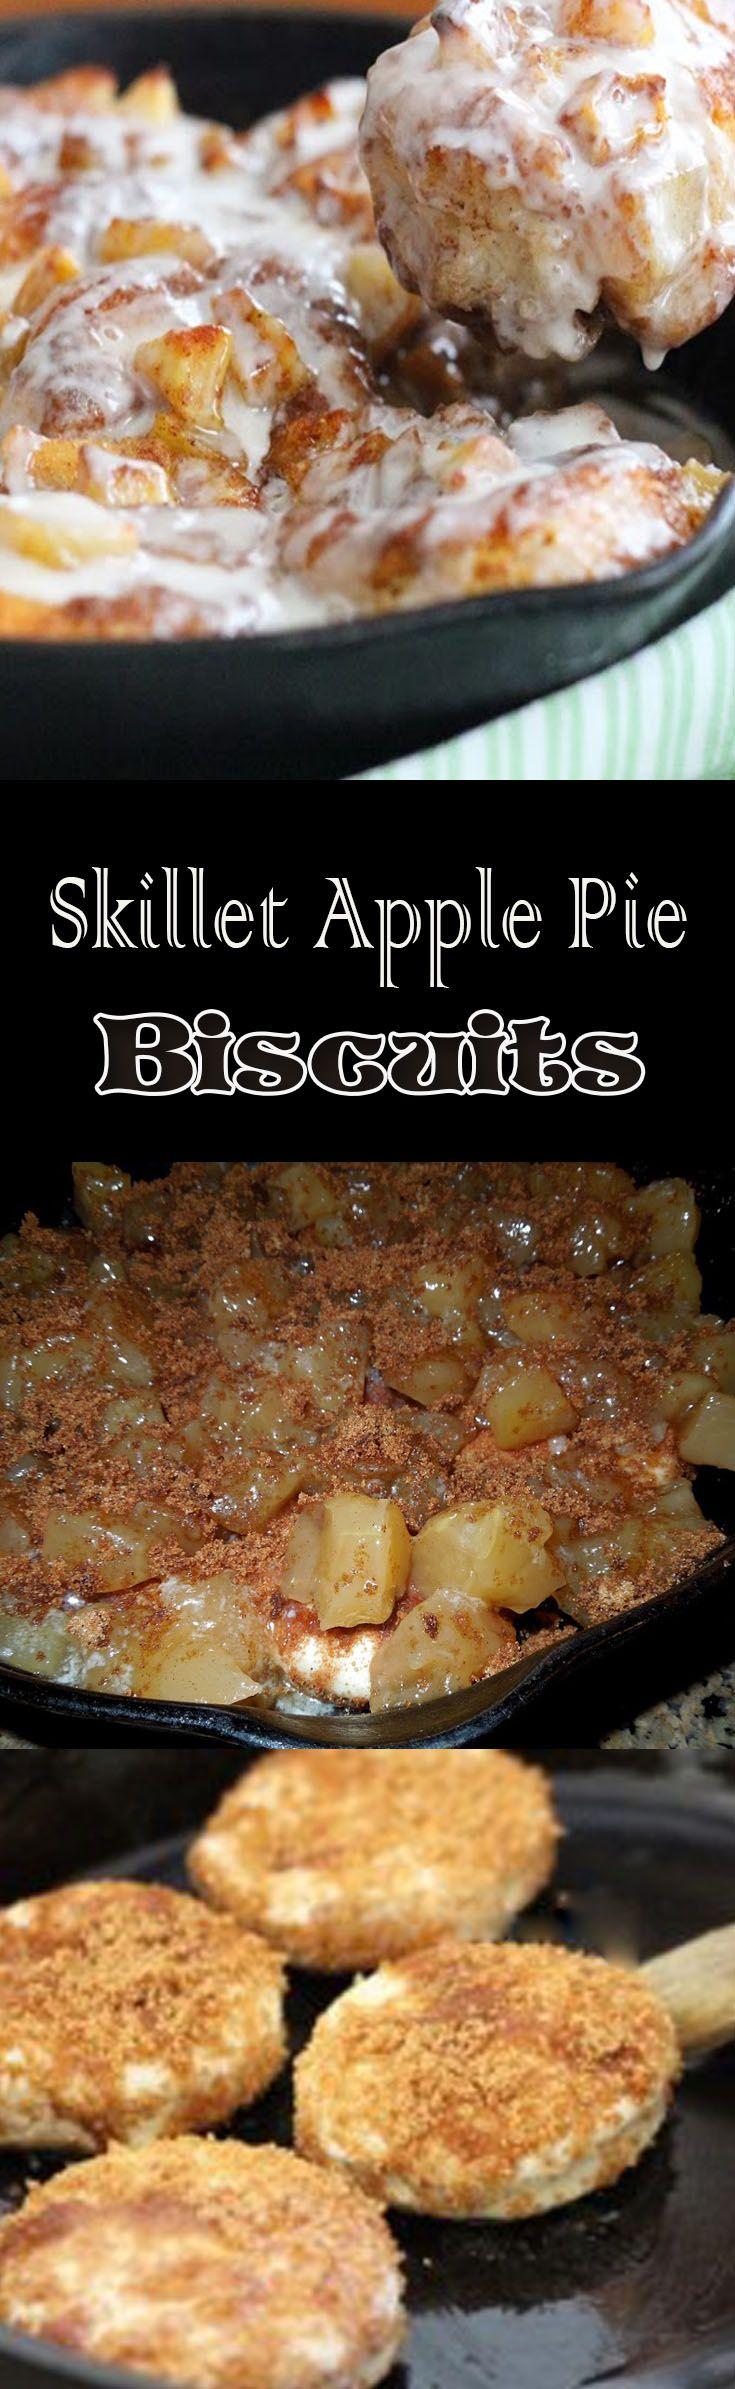 Skillet Apple Pie Biscuits                                                                                                                                                                                 More